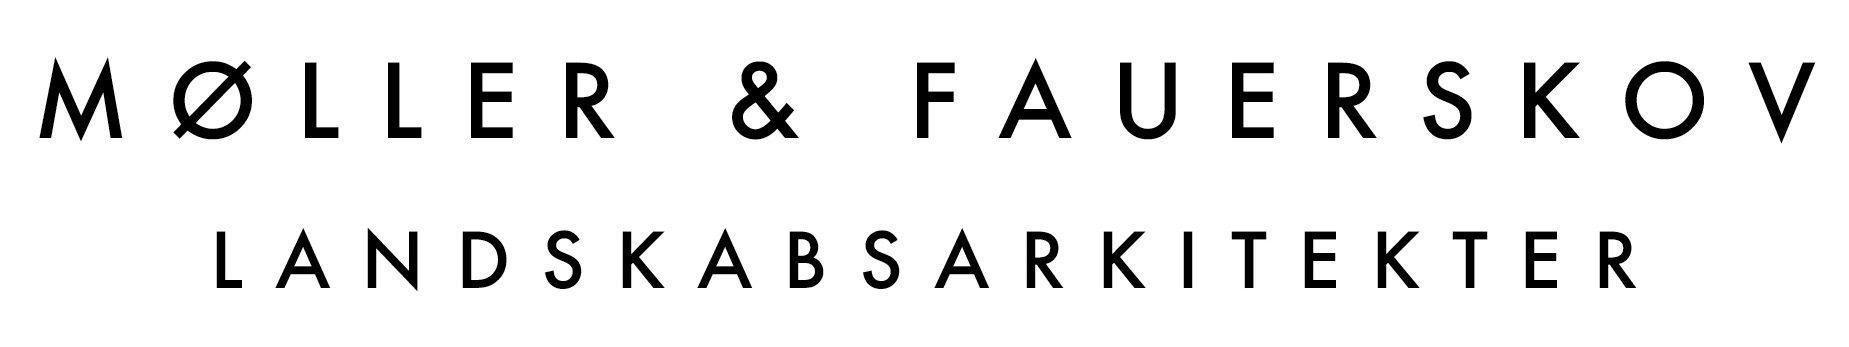 Møller & Fauerskov Landskabsarkitekter